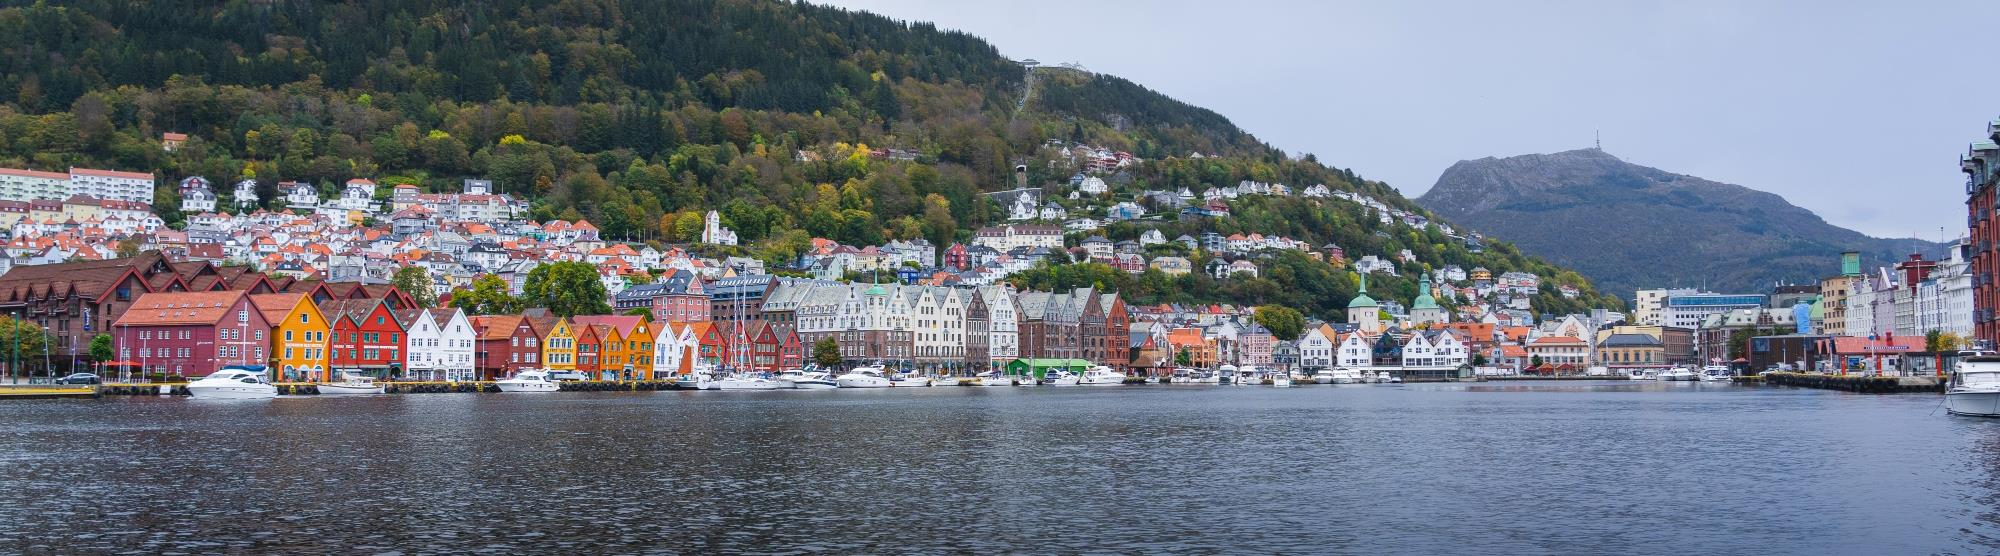 Bergen Kristiansand